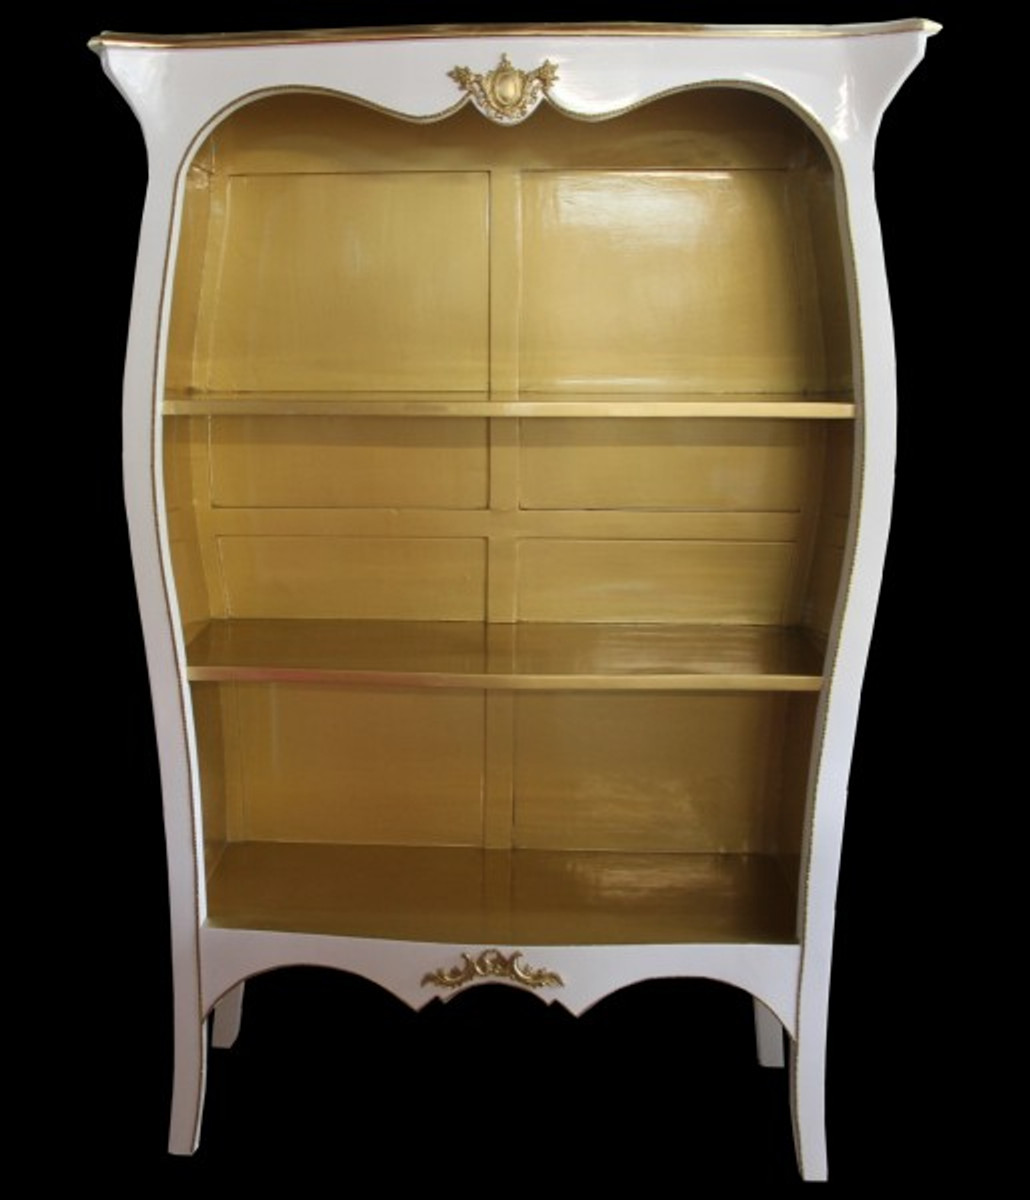 Casa Padrino Barock Bücherschrank Weiß Hochglanz / Gold B 110 x H 169 cm Bücherregal Regal Schrank - Limited Edition 2